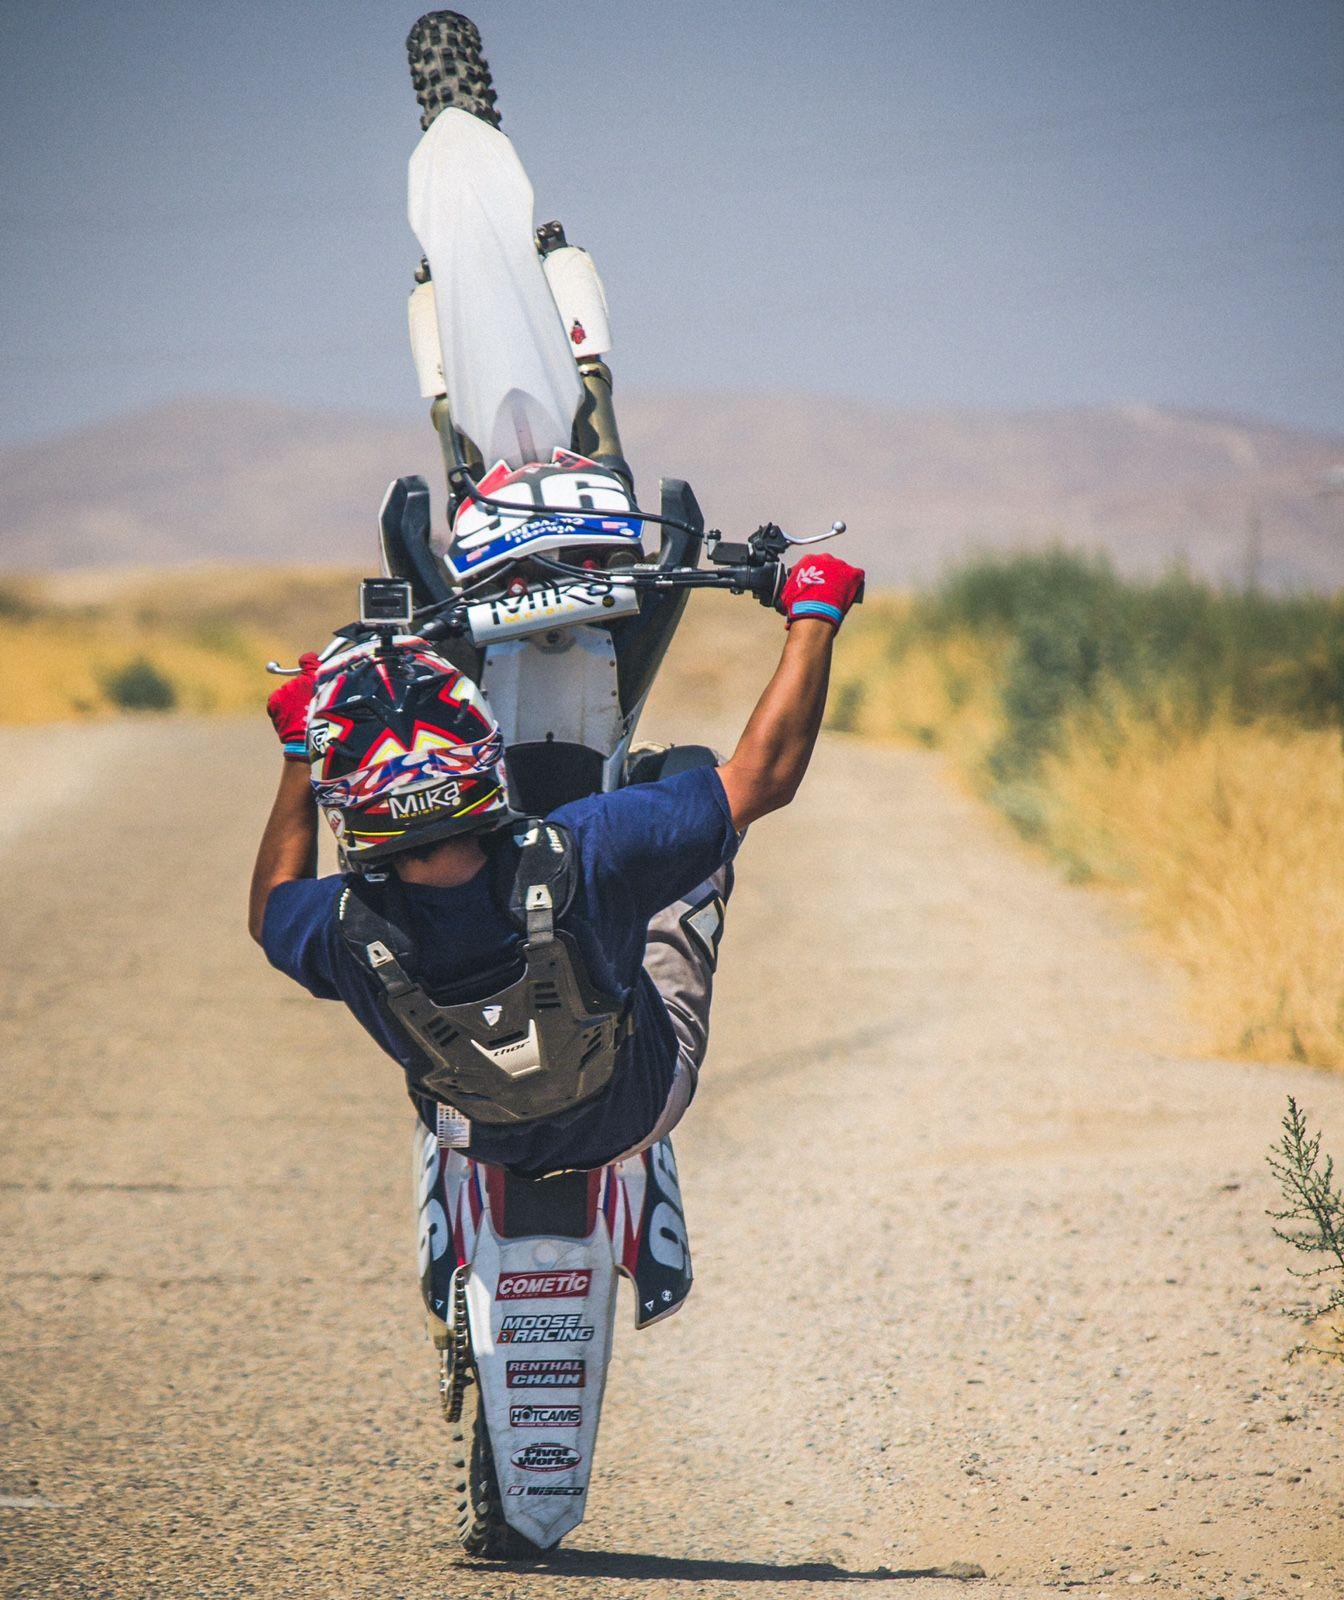 It S 12 O Clock Wheelie Somewhere Friggin Awesome Golf Bags Motocross Bags